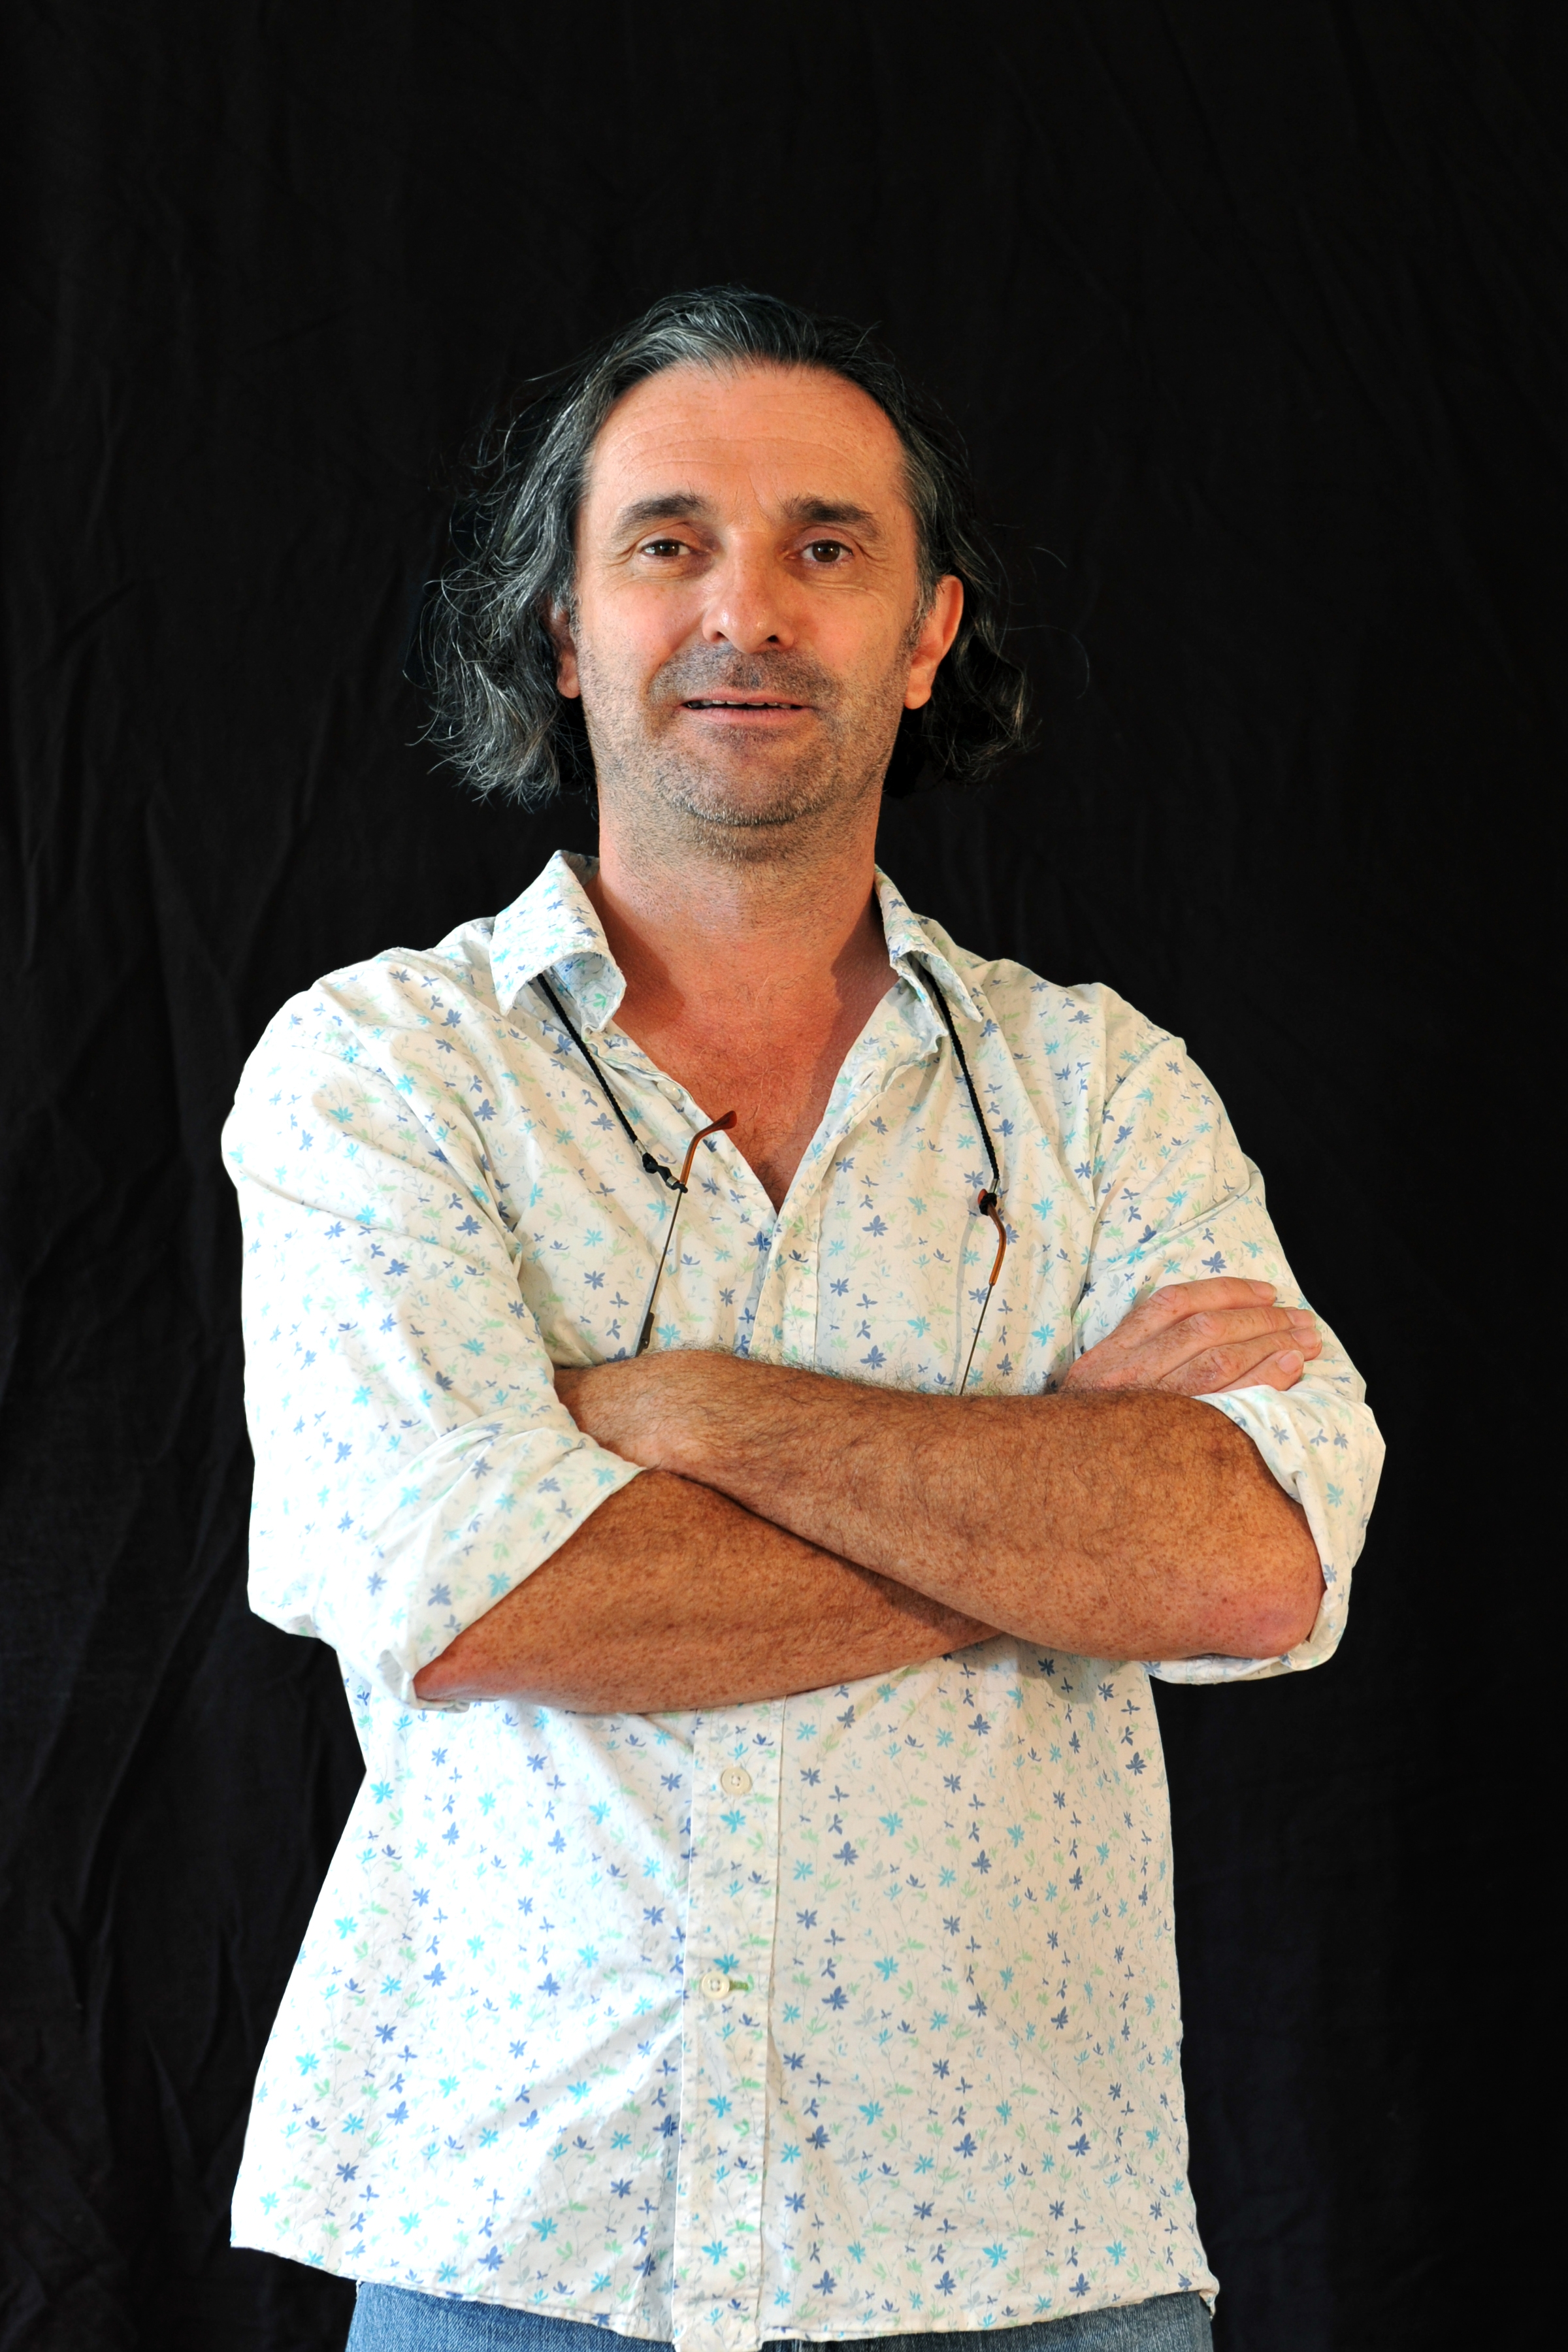 Jean Louis Sabaji Summer 2014: Cooking The Conference#7 – Jean-Louis Kerouanton